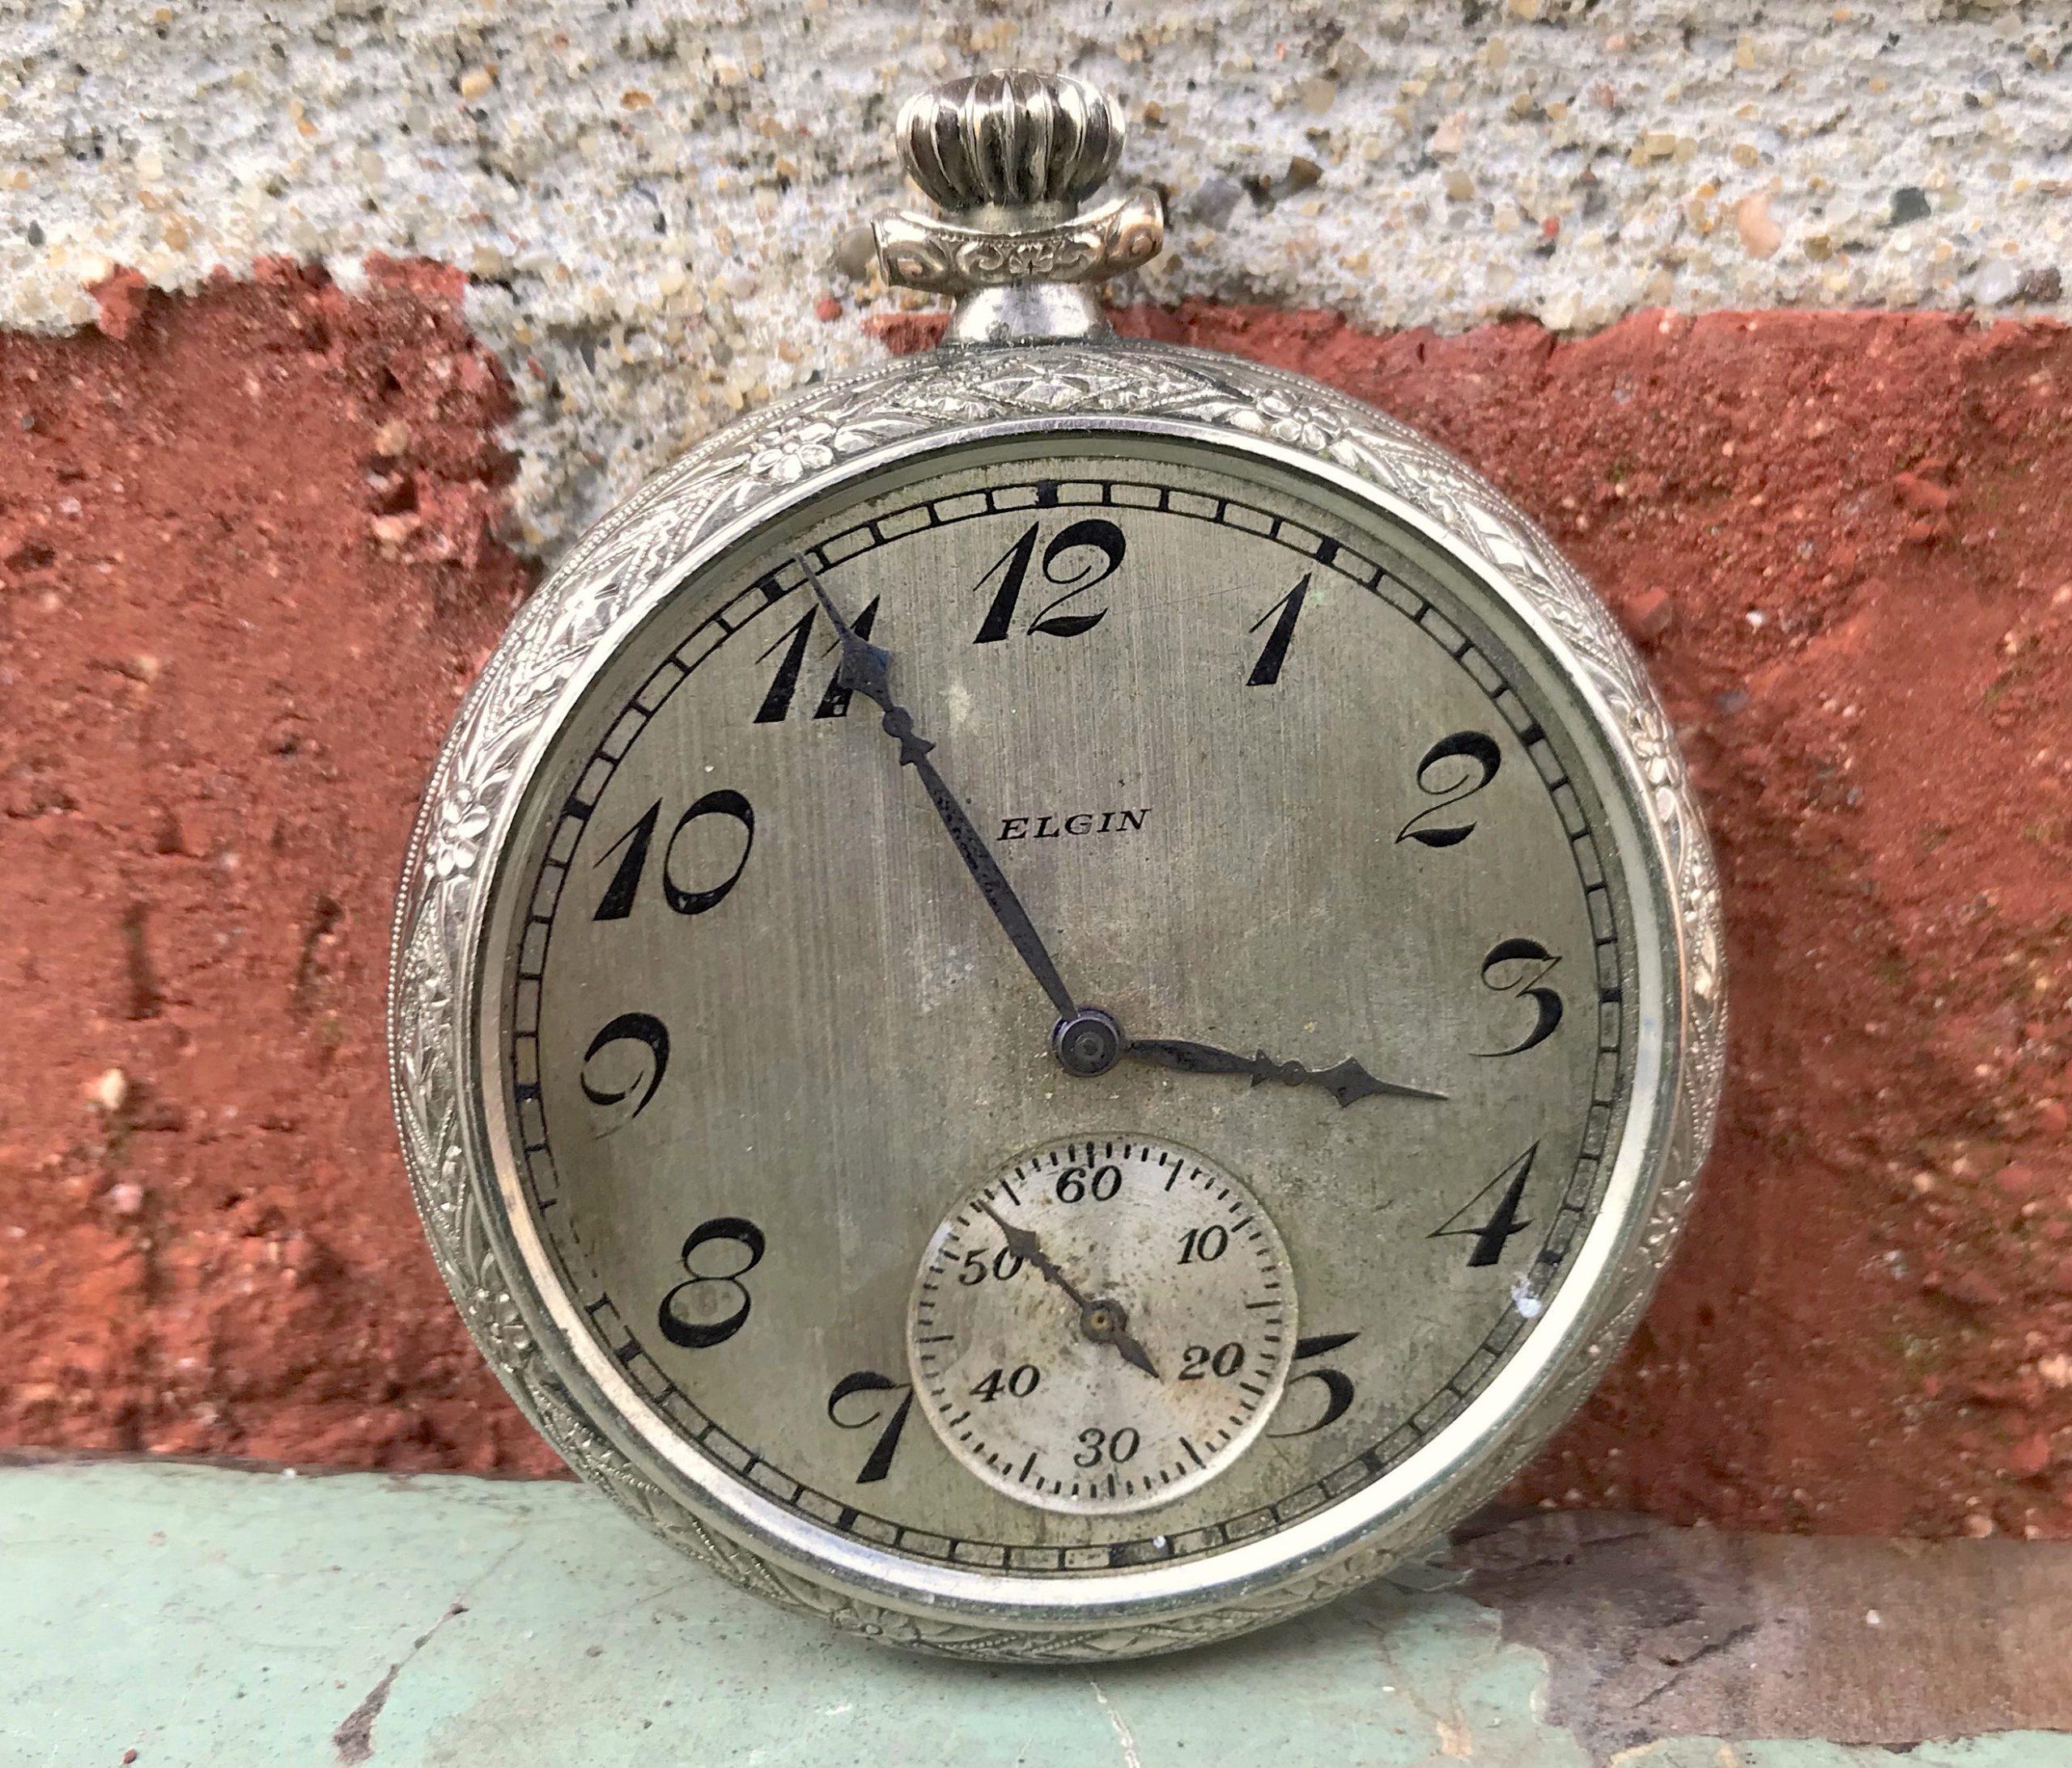 Elgin Watch History